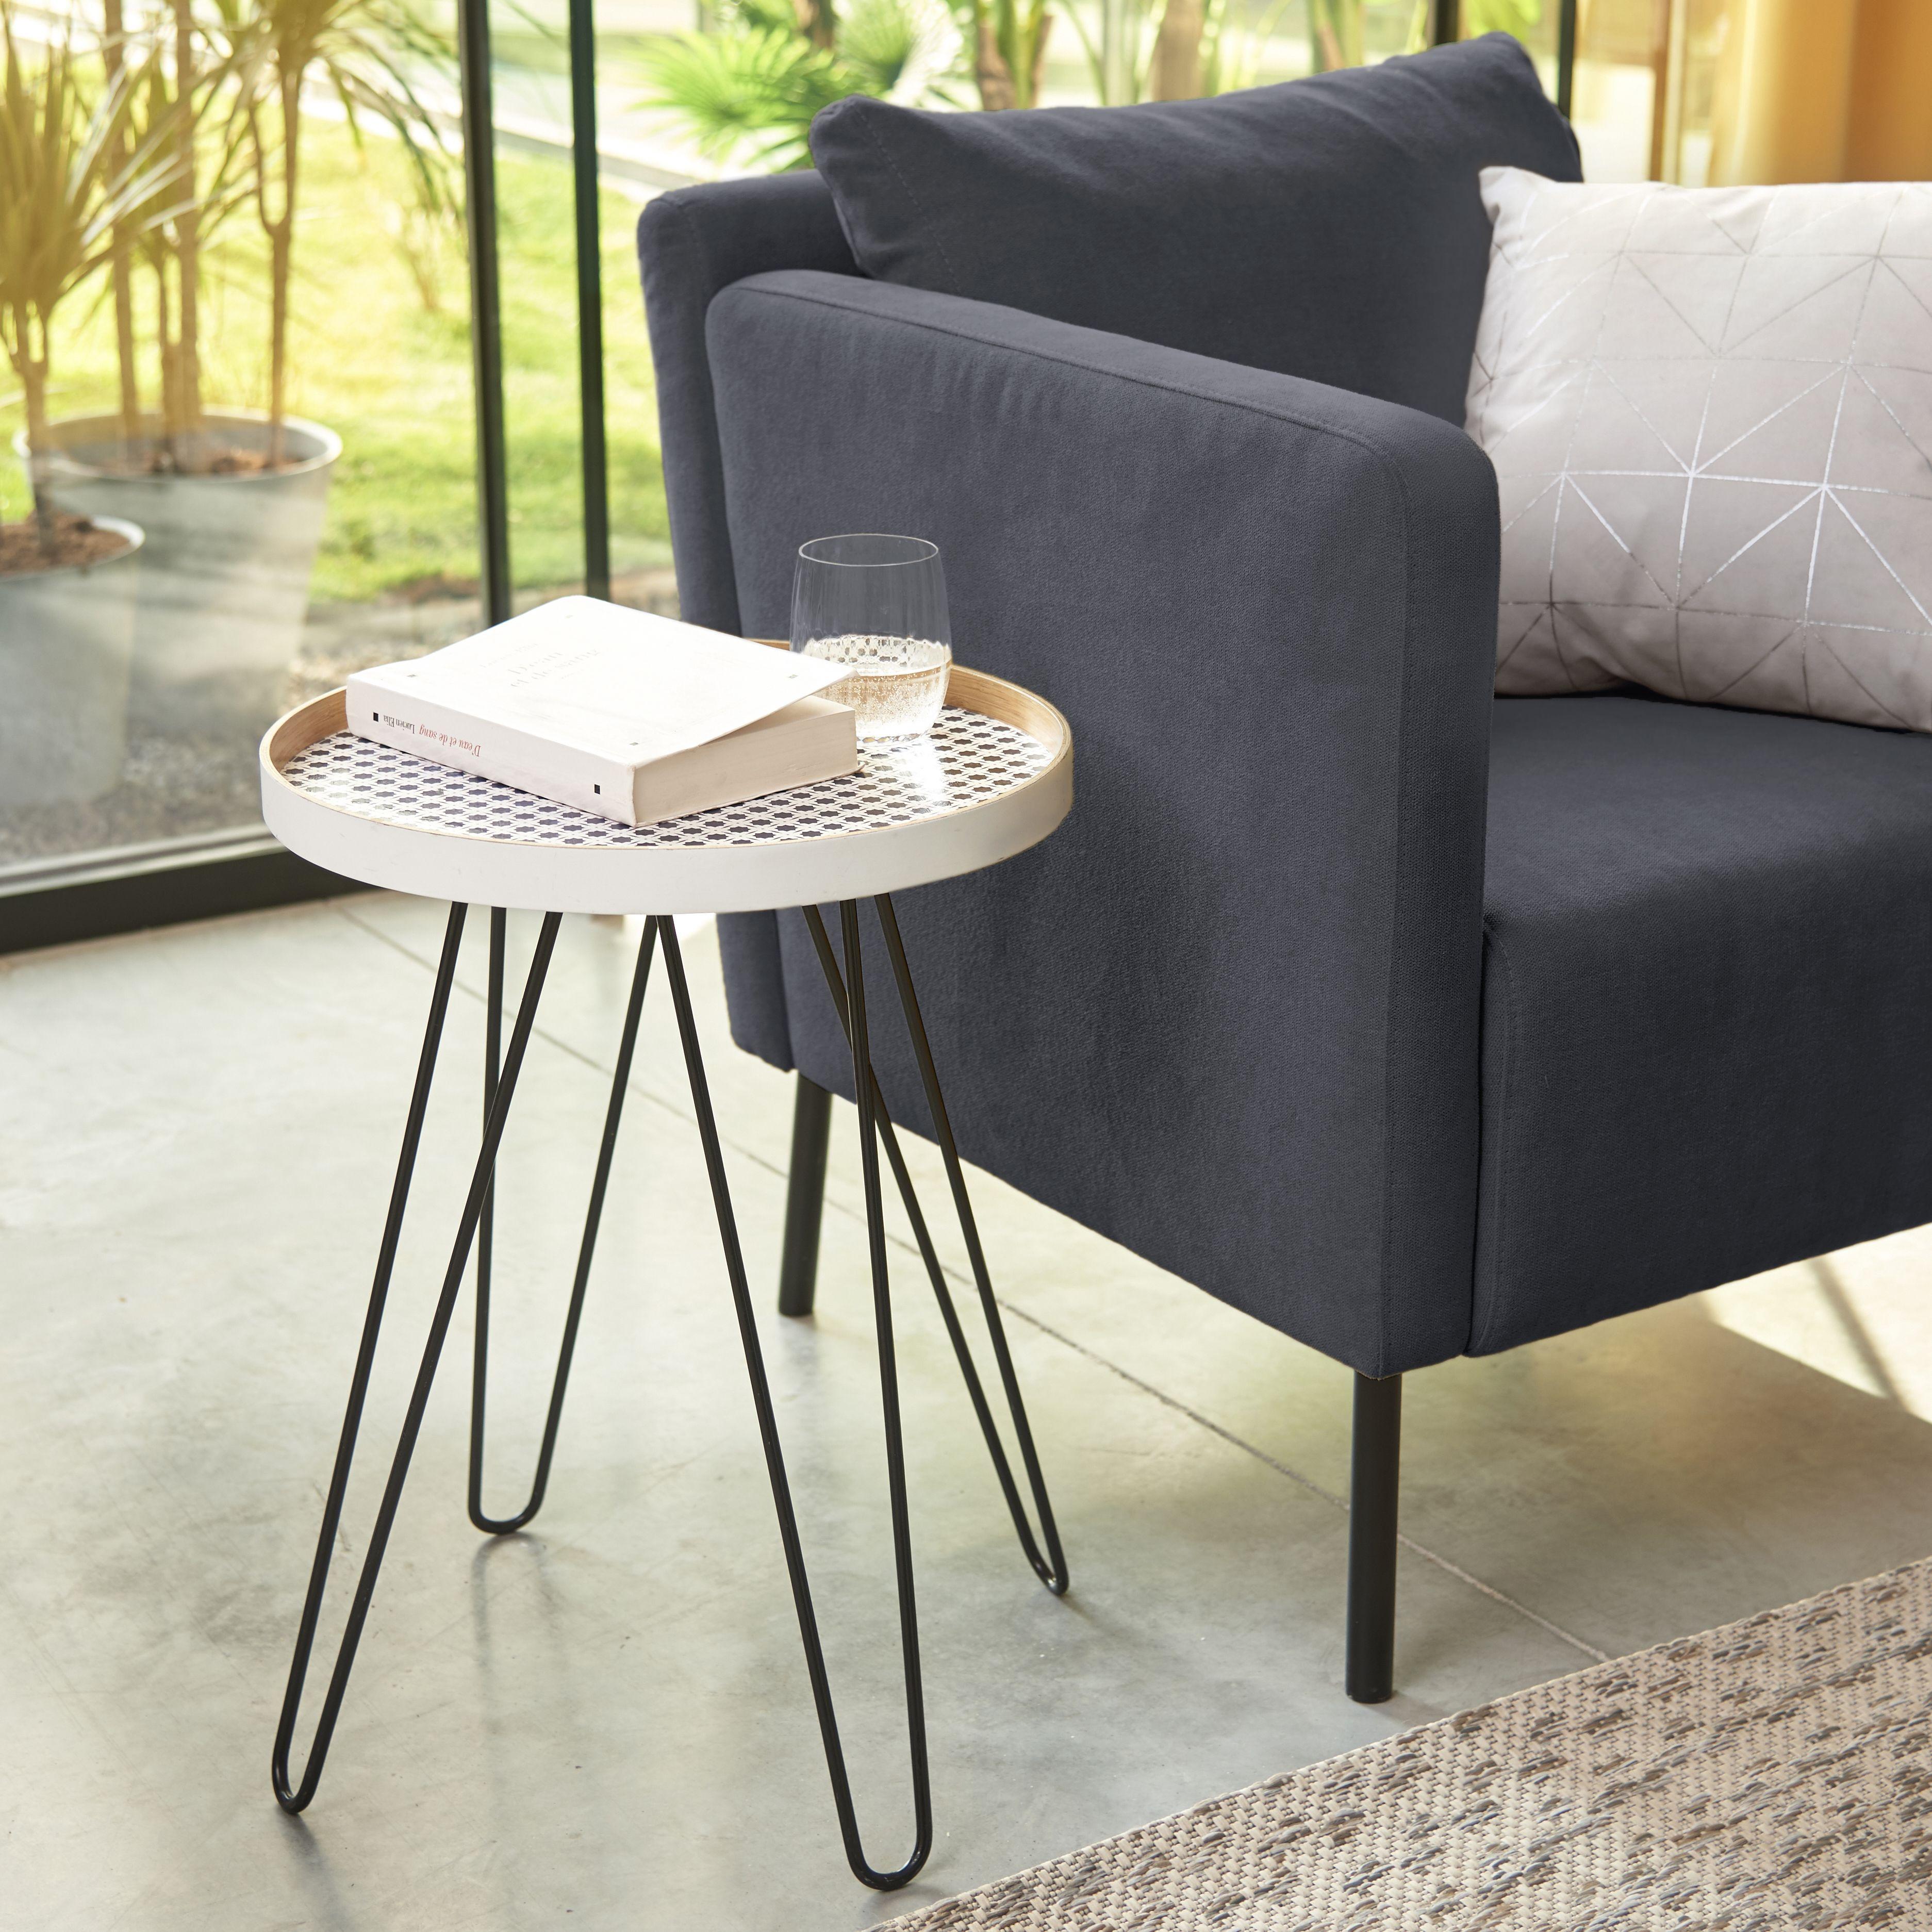 dama bout de canap avec pieds en m tal pingles alin a pi ce de vie s salon. Black Bedroom Furniture Sets. Home Design Ideas